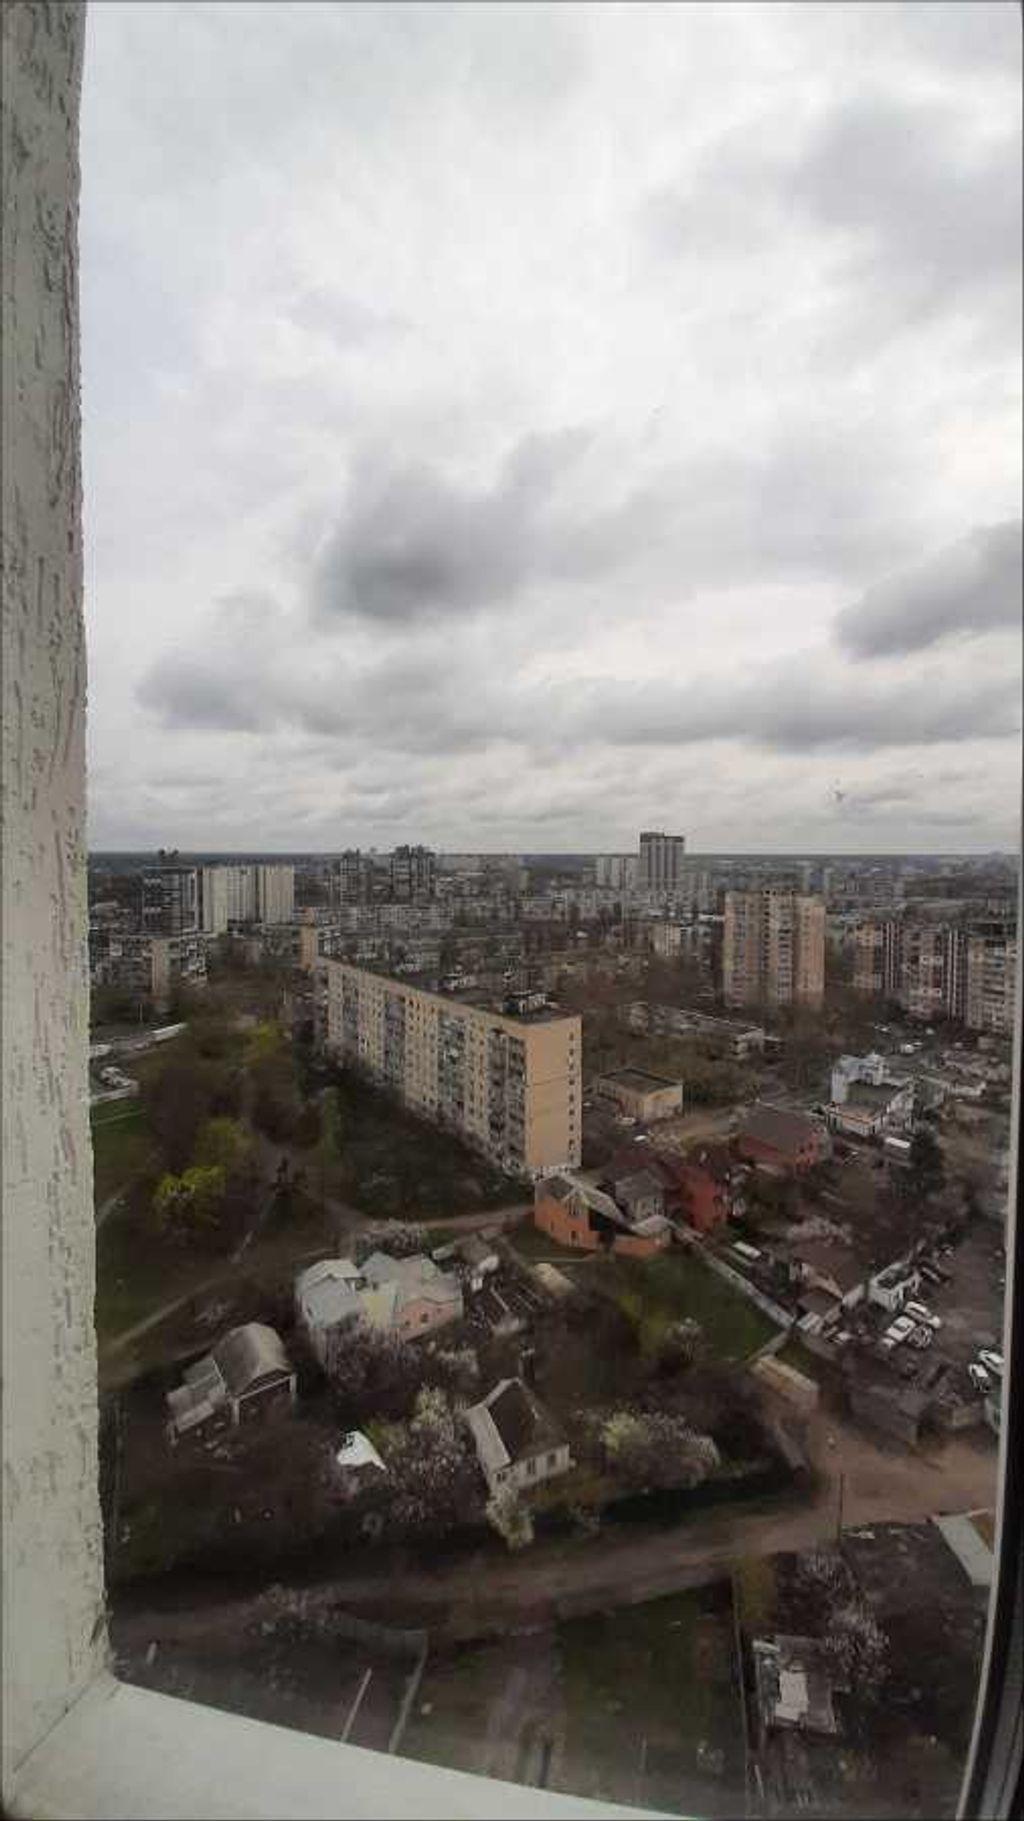 продам 2-комнатную квартиру Киев, ул.Ярослава Гашека бульв. 20 - Фото 3